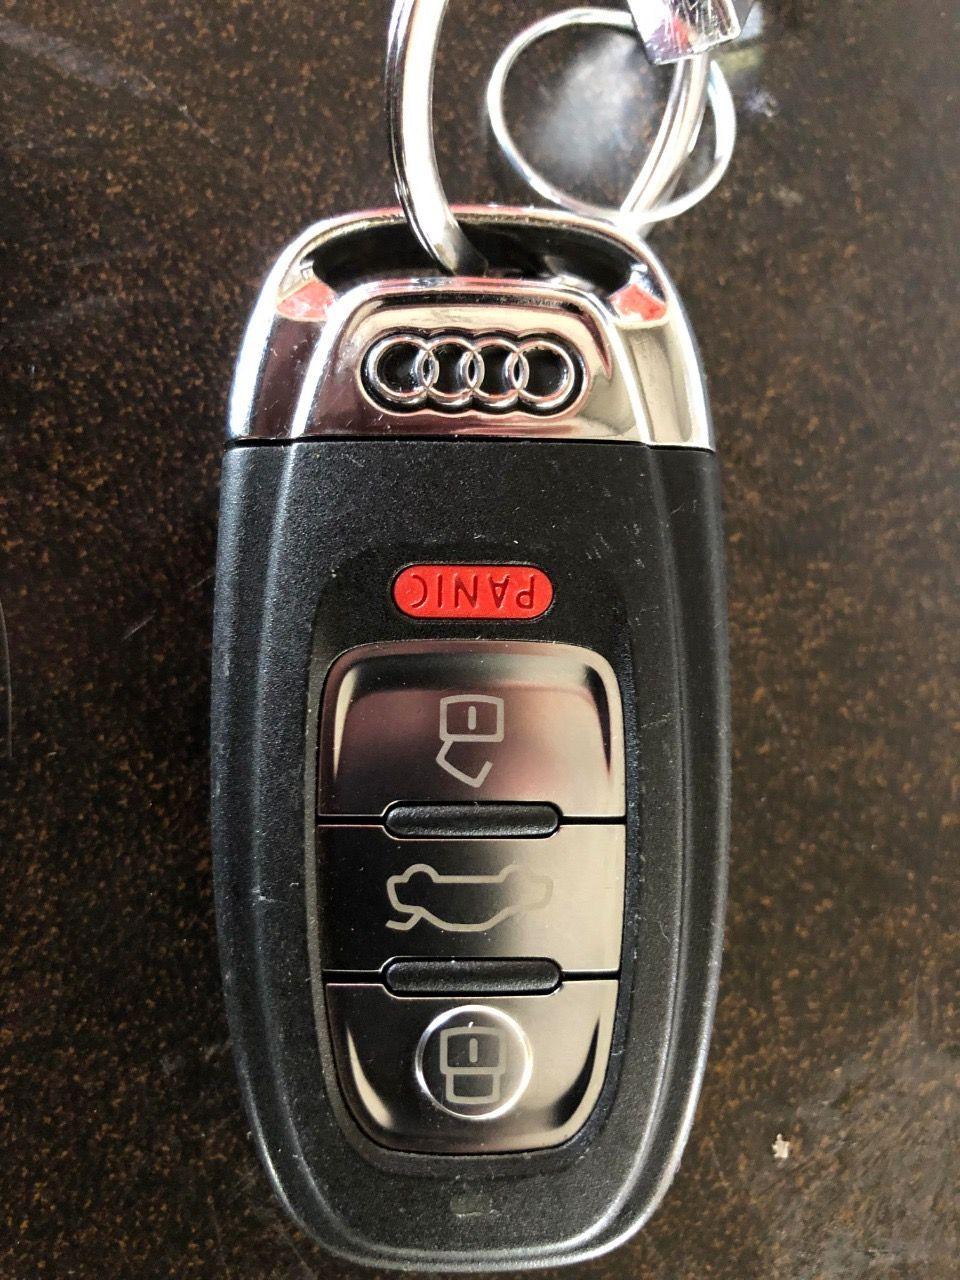 Get Exclusive Auto Locksmith Philadelphia Auto Locksmith